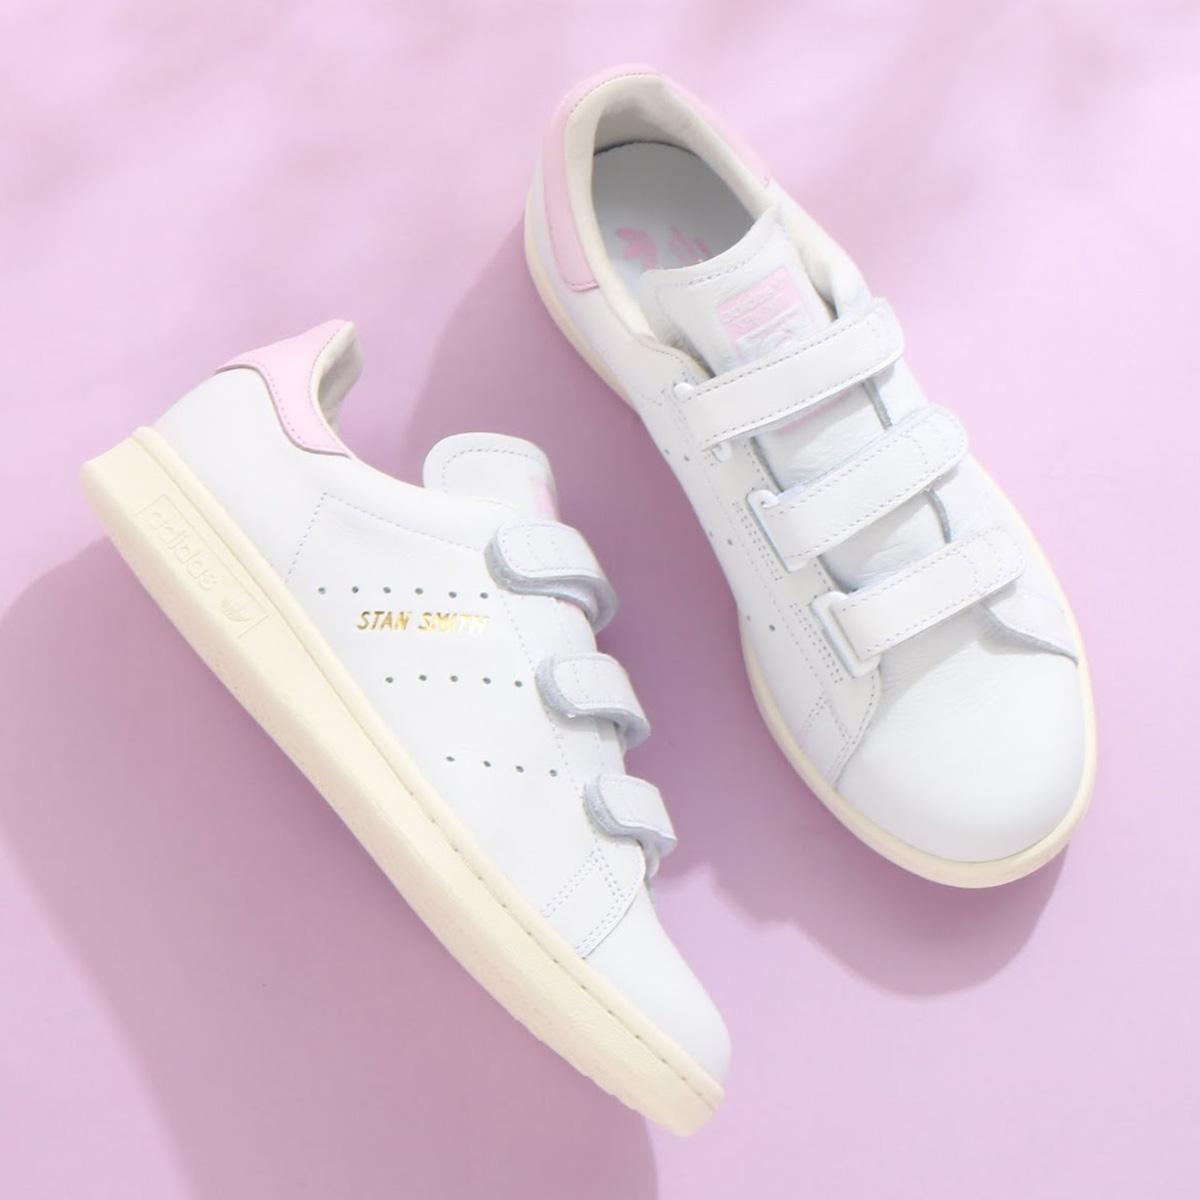 adidas Originals STAN SMITH CF(アディダス オリジナルス スタンスミス CF)Running White/Running White/Aero Pink【レディース スニーカー】18SS-I